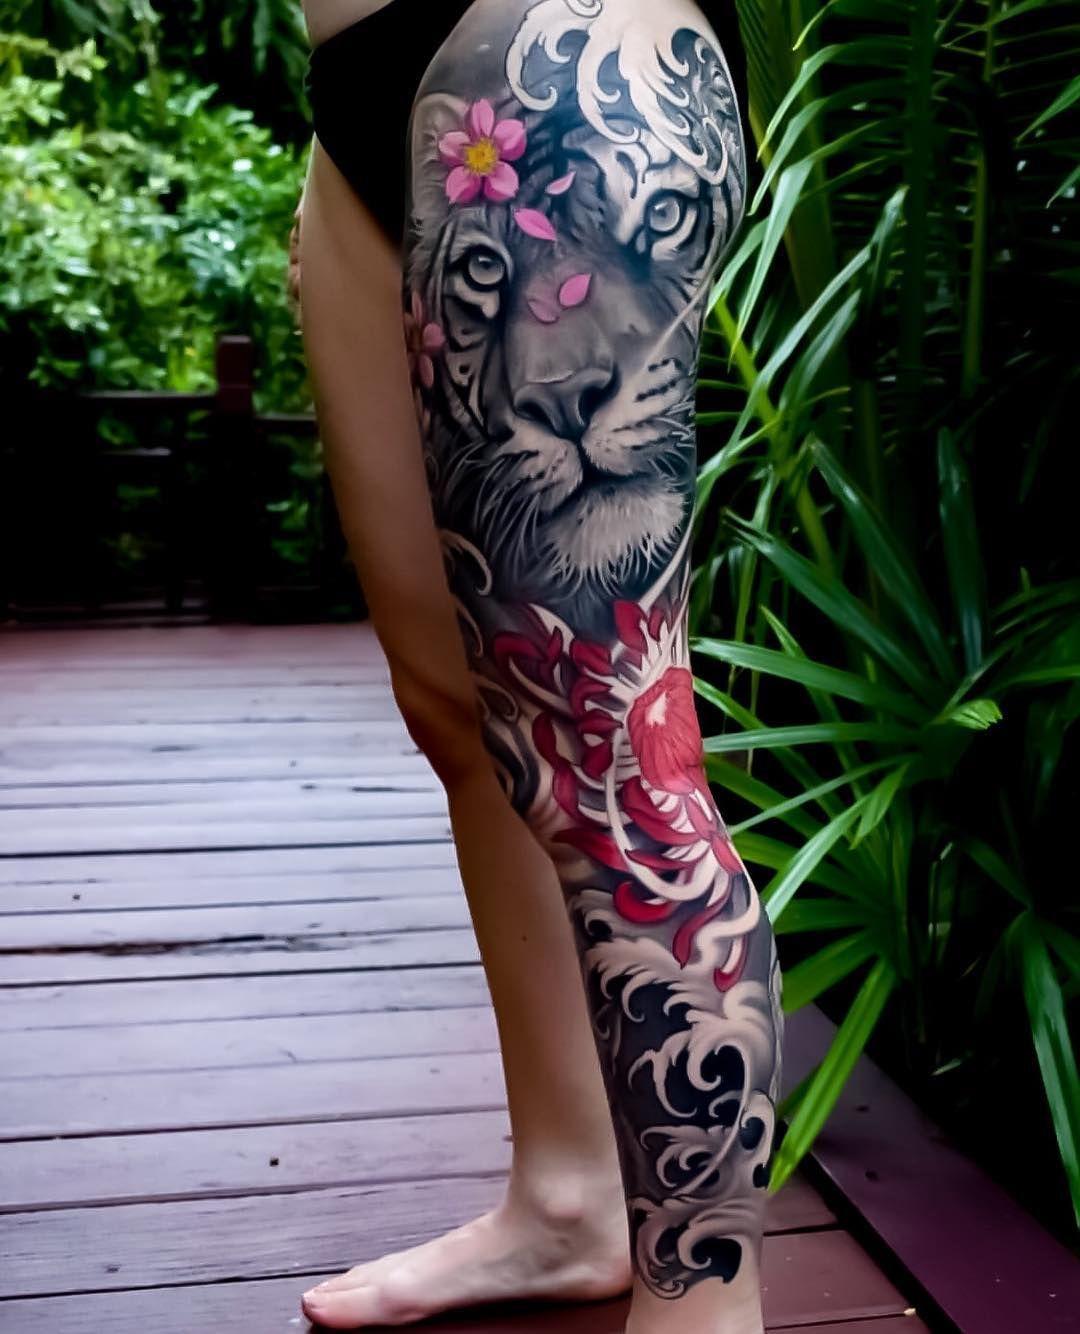 "Japanese Ink on Instagram: ""Japanese leg-sleeve tattoo by @eviltwinsjohan.  #japaneseink #japanesetattoo #irezumi #tebori #colortattoo #colorfultattoo #cooltattoo…"""